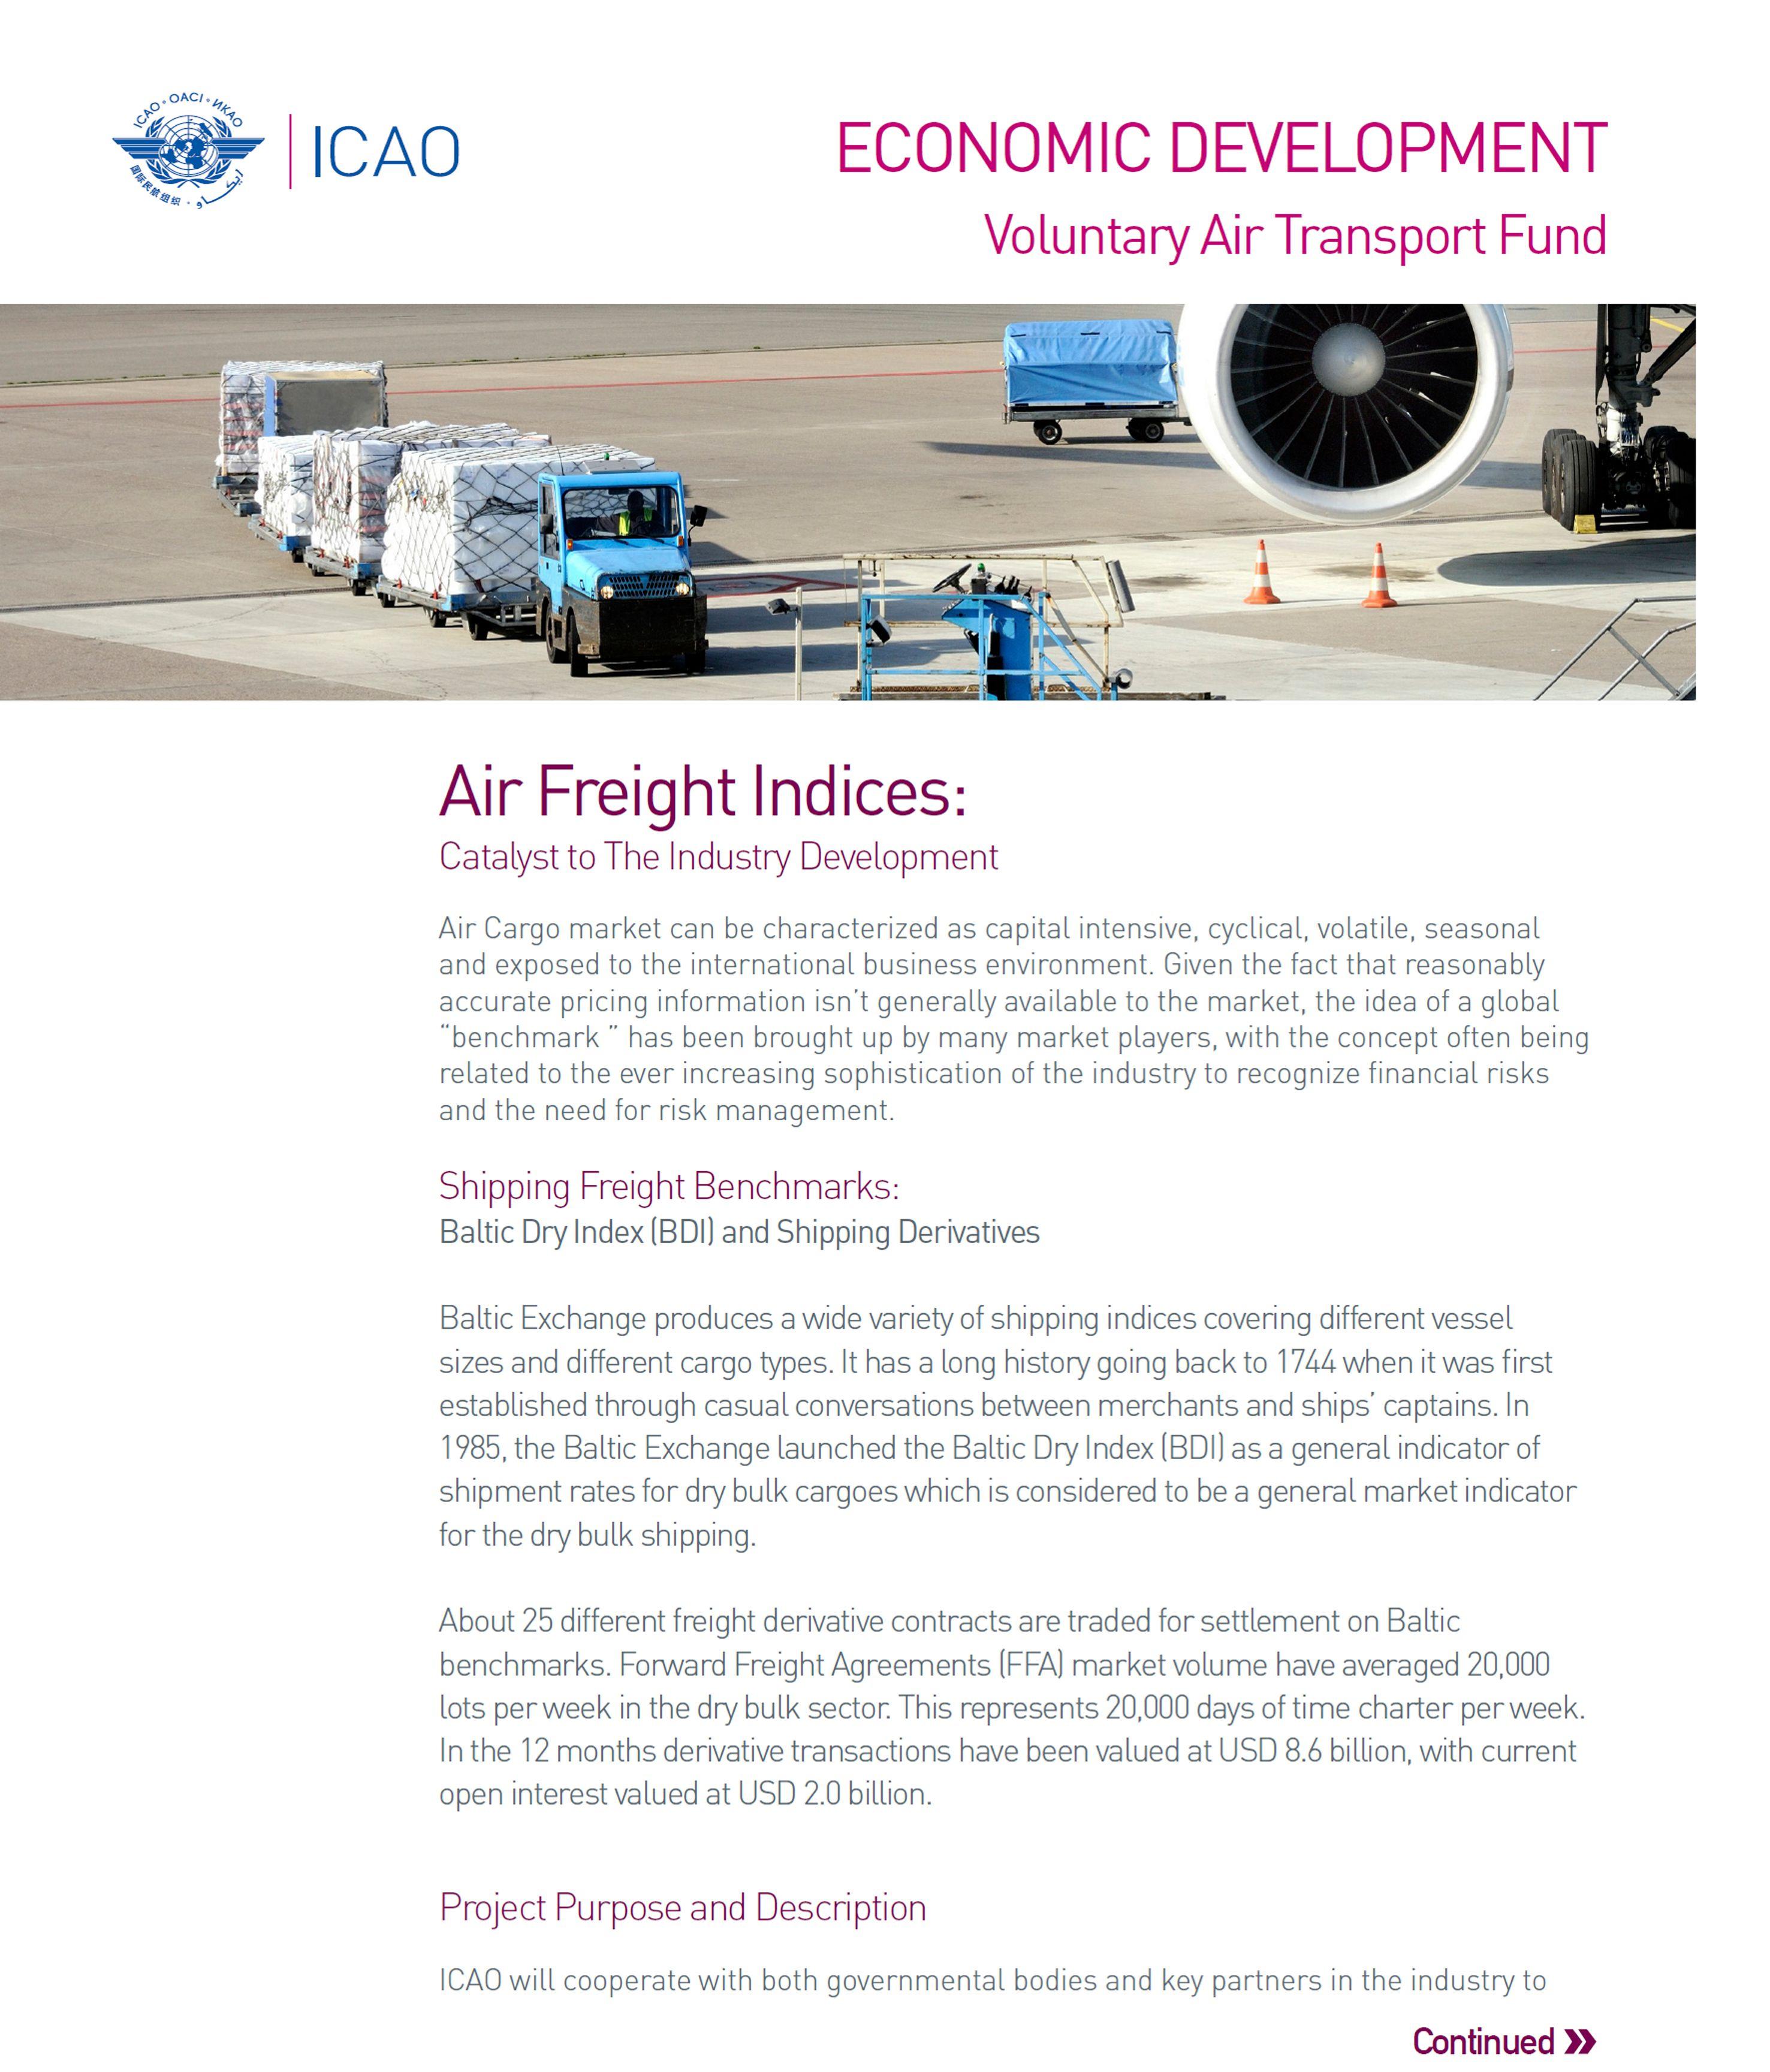 Voluntary Air Transport Fund